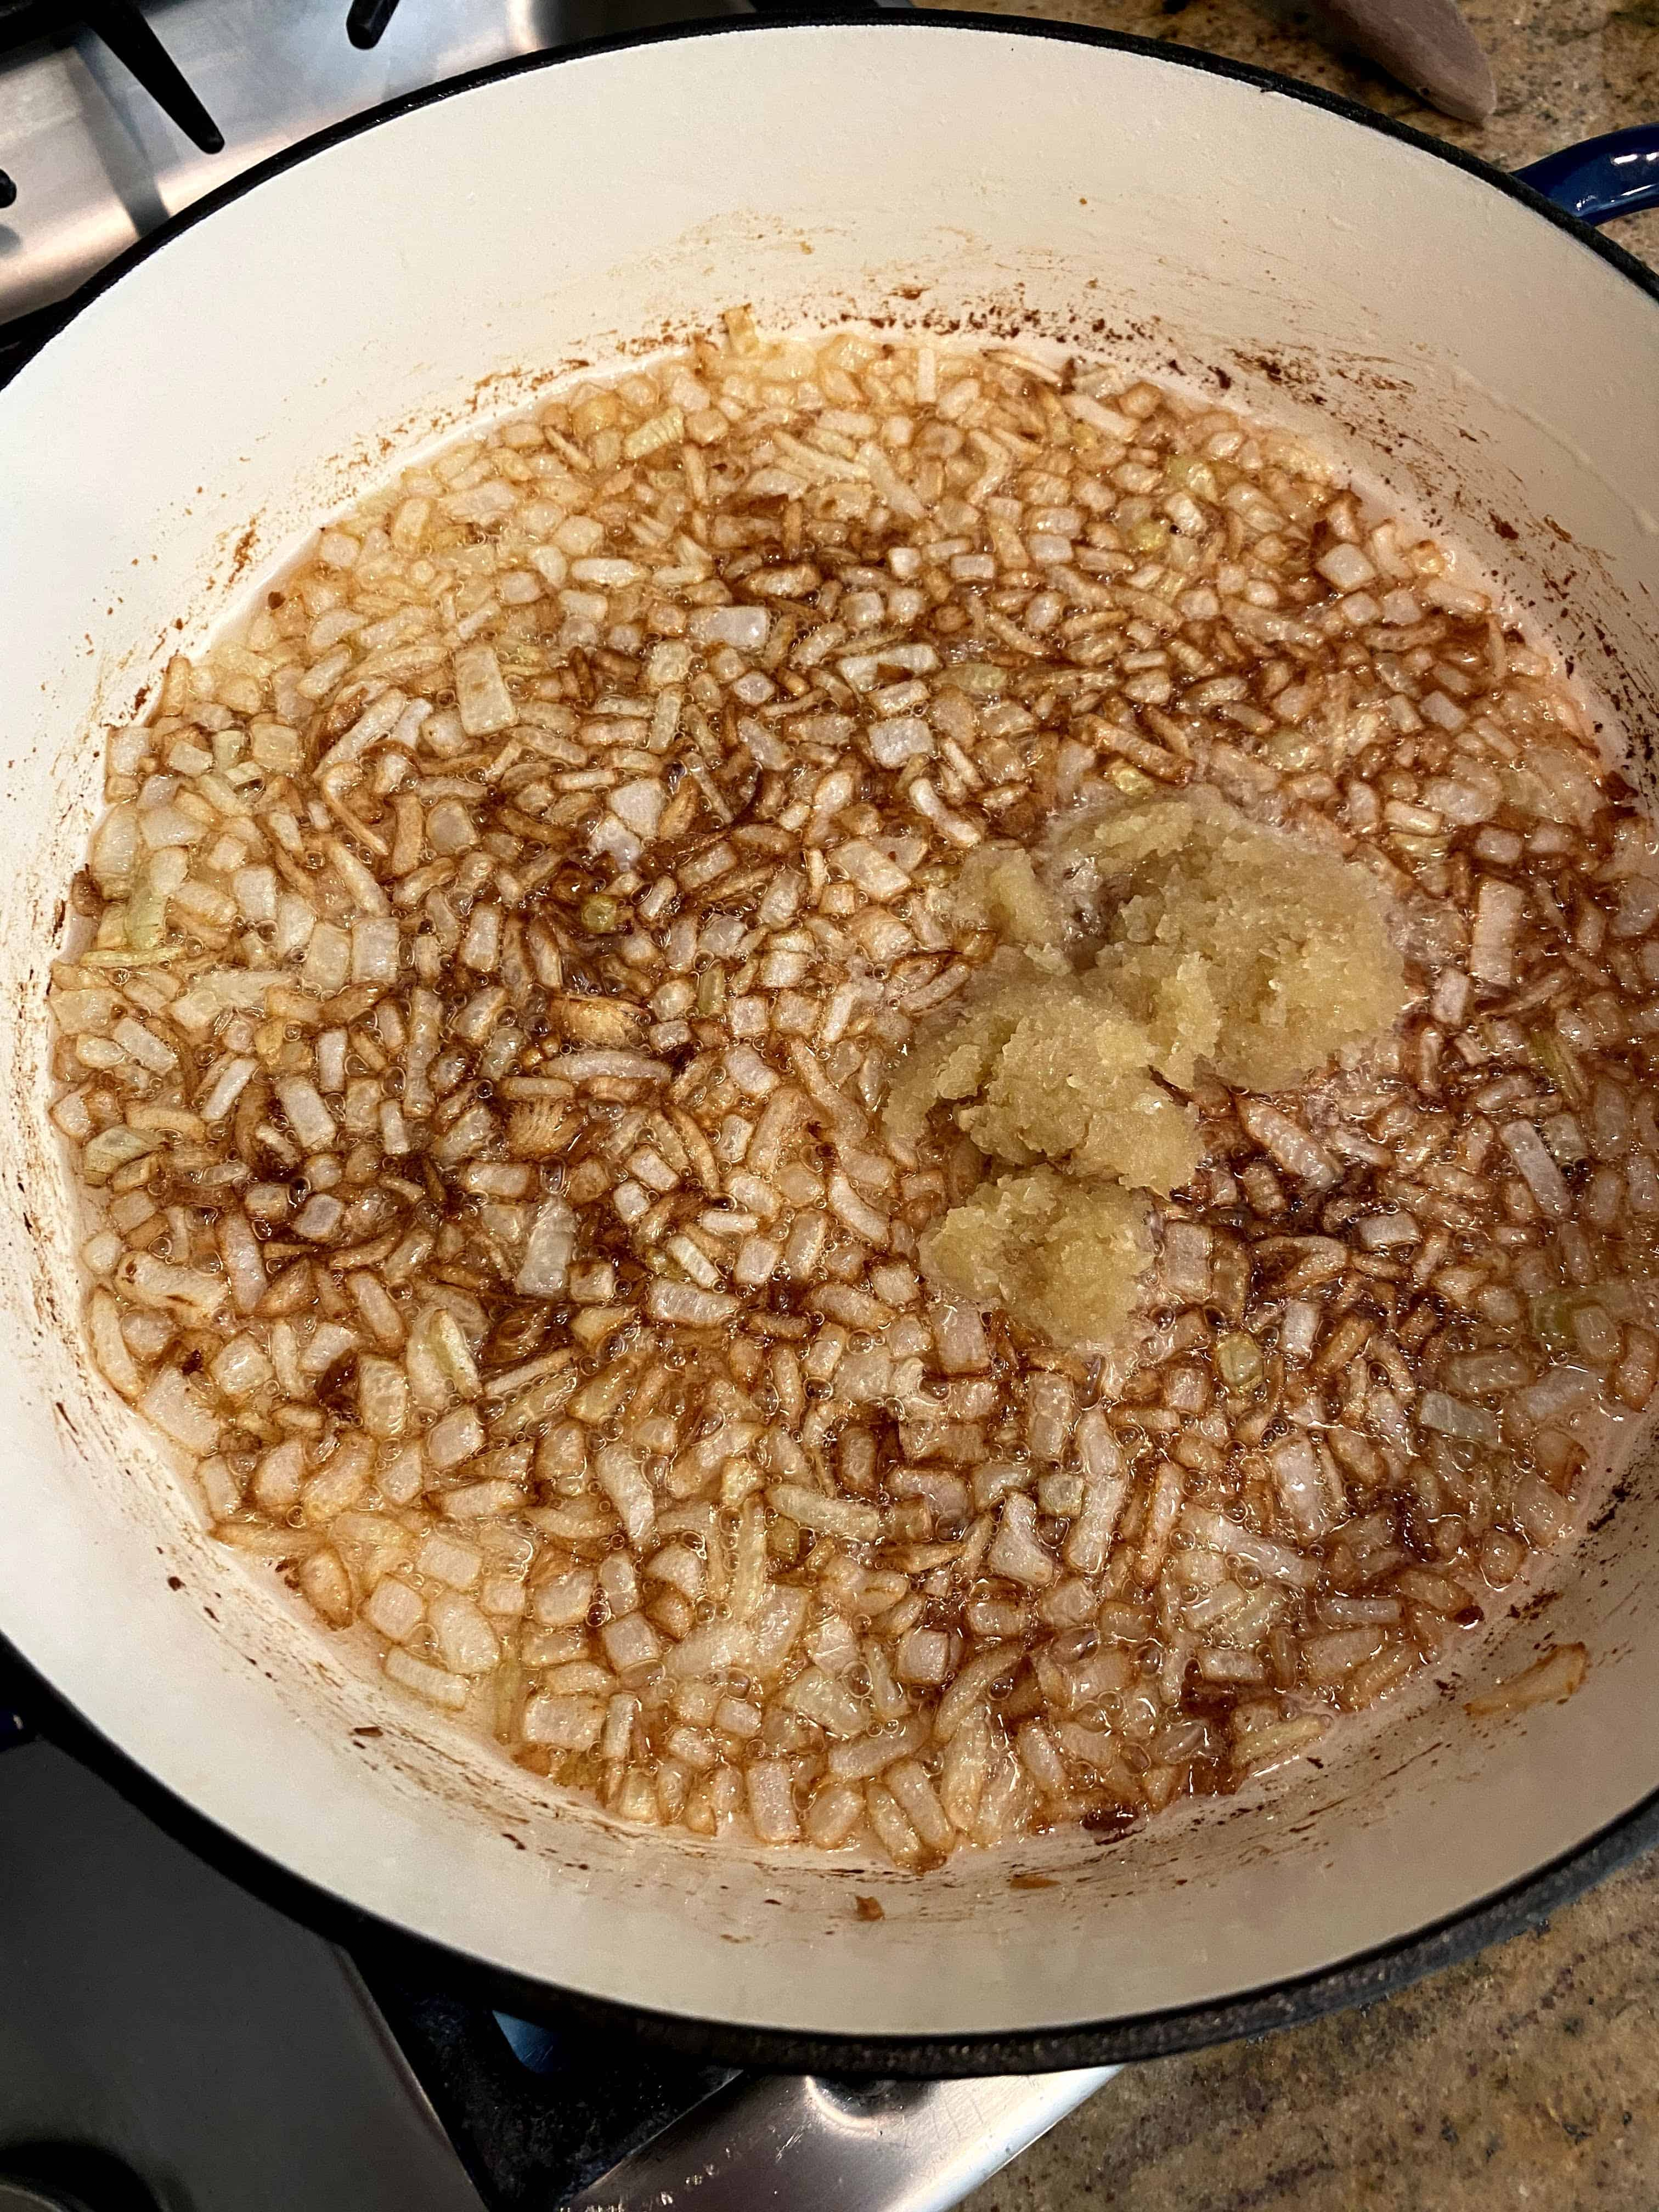 saute onions and garlic